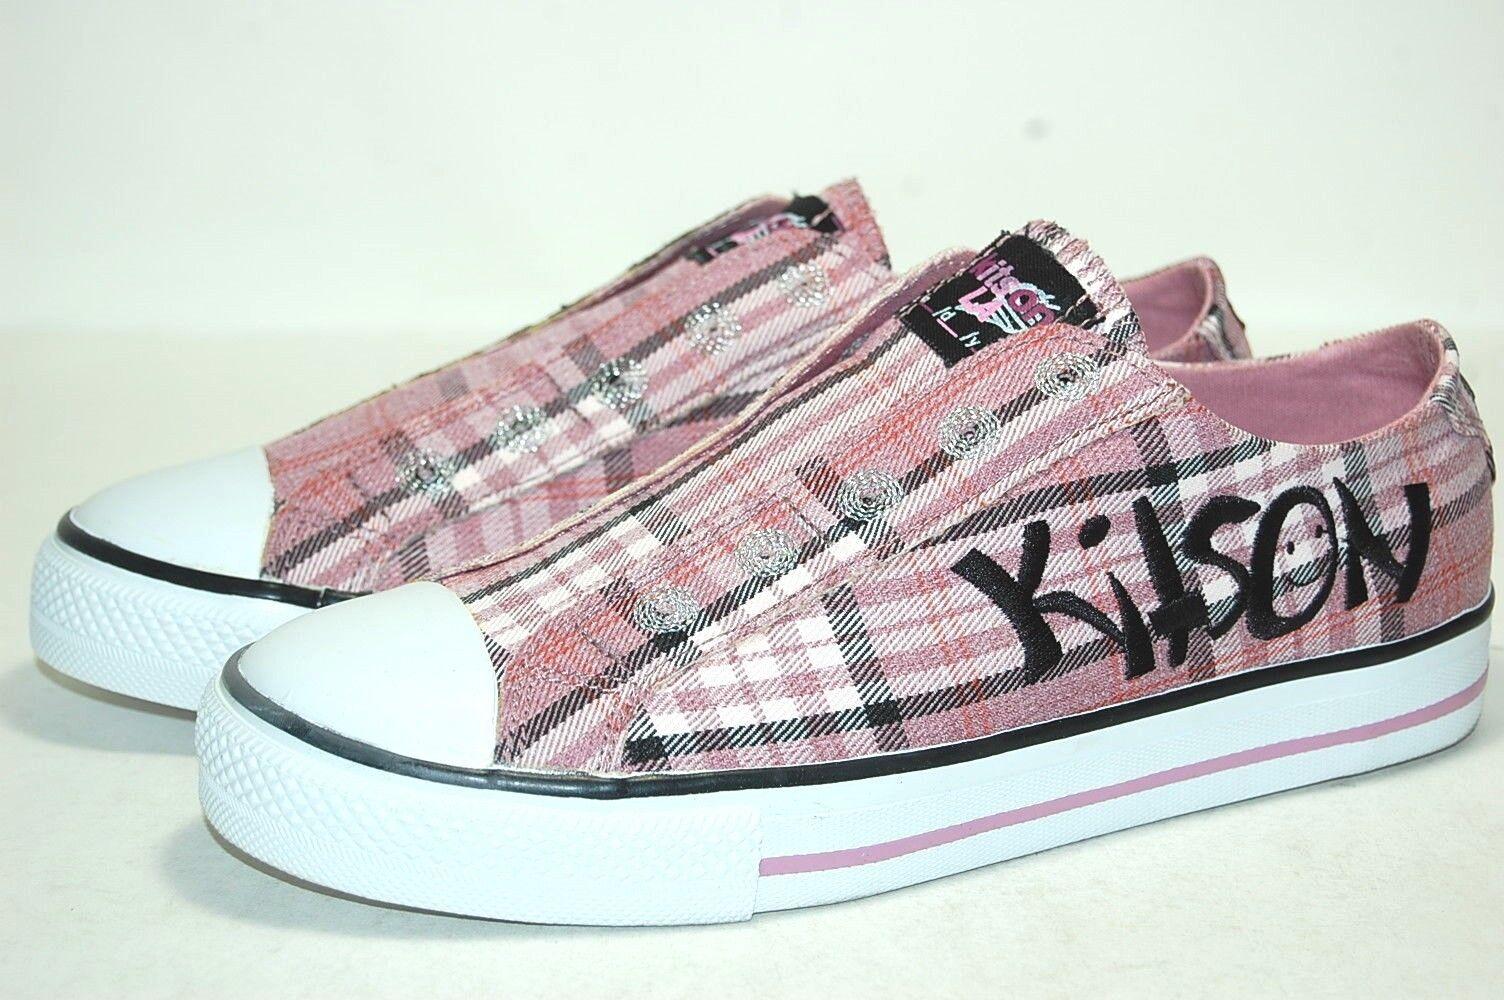 Original Kitson Smile 34521 BKPK Casual donna scarpe